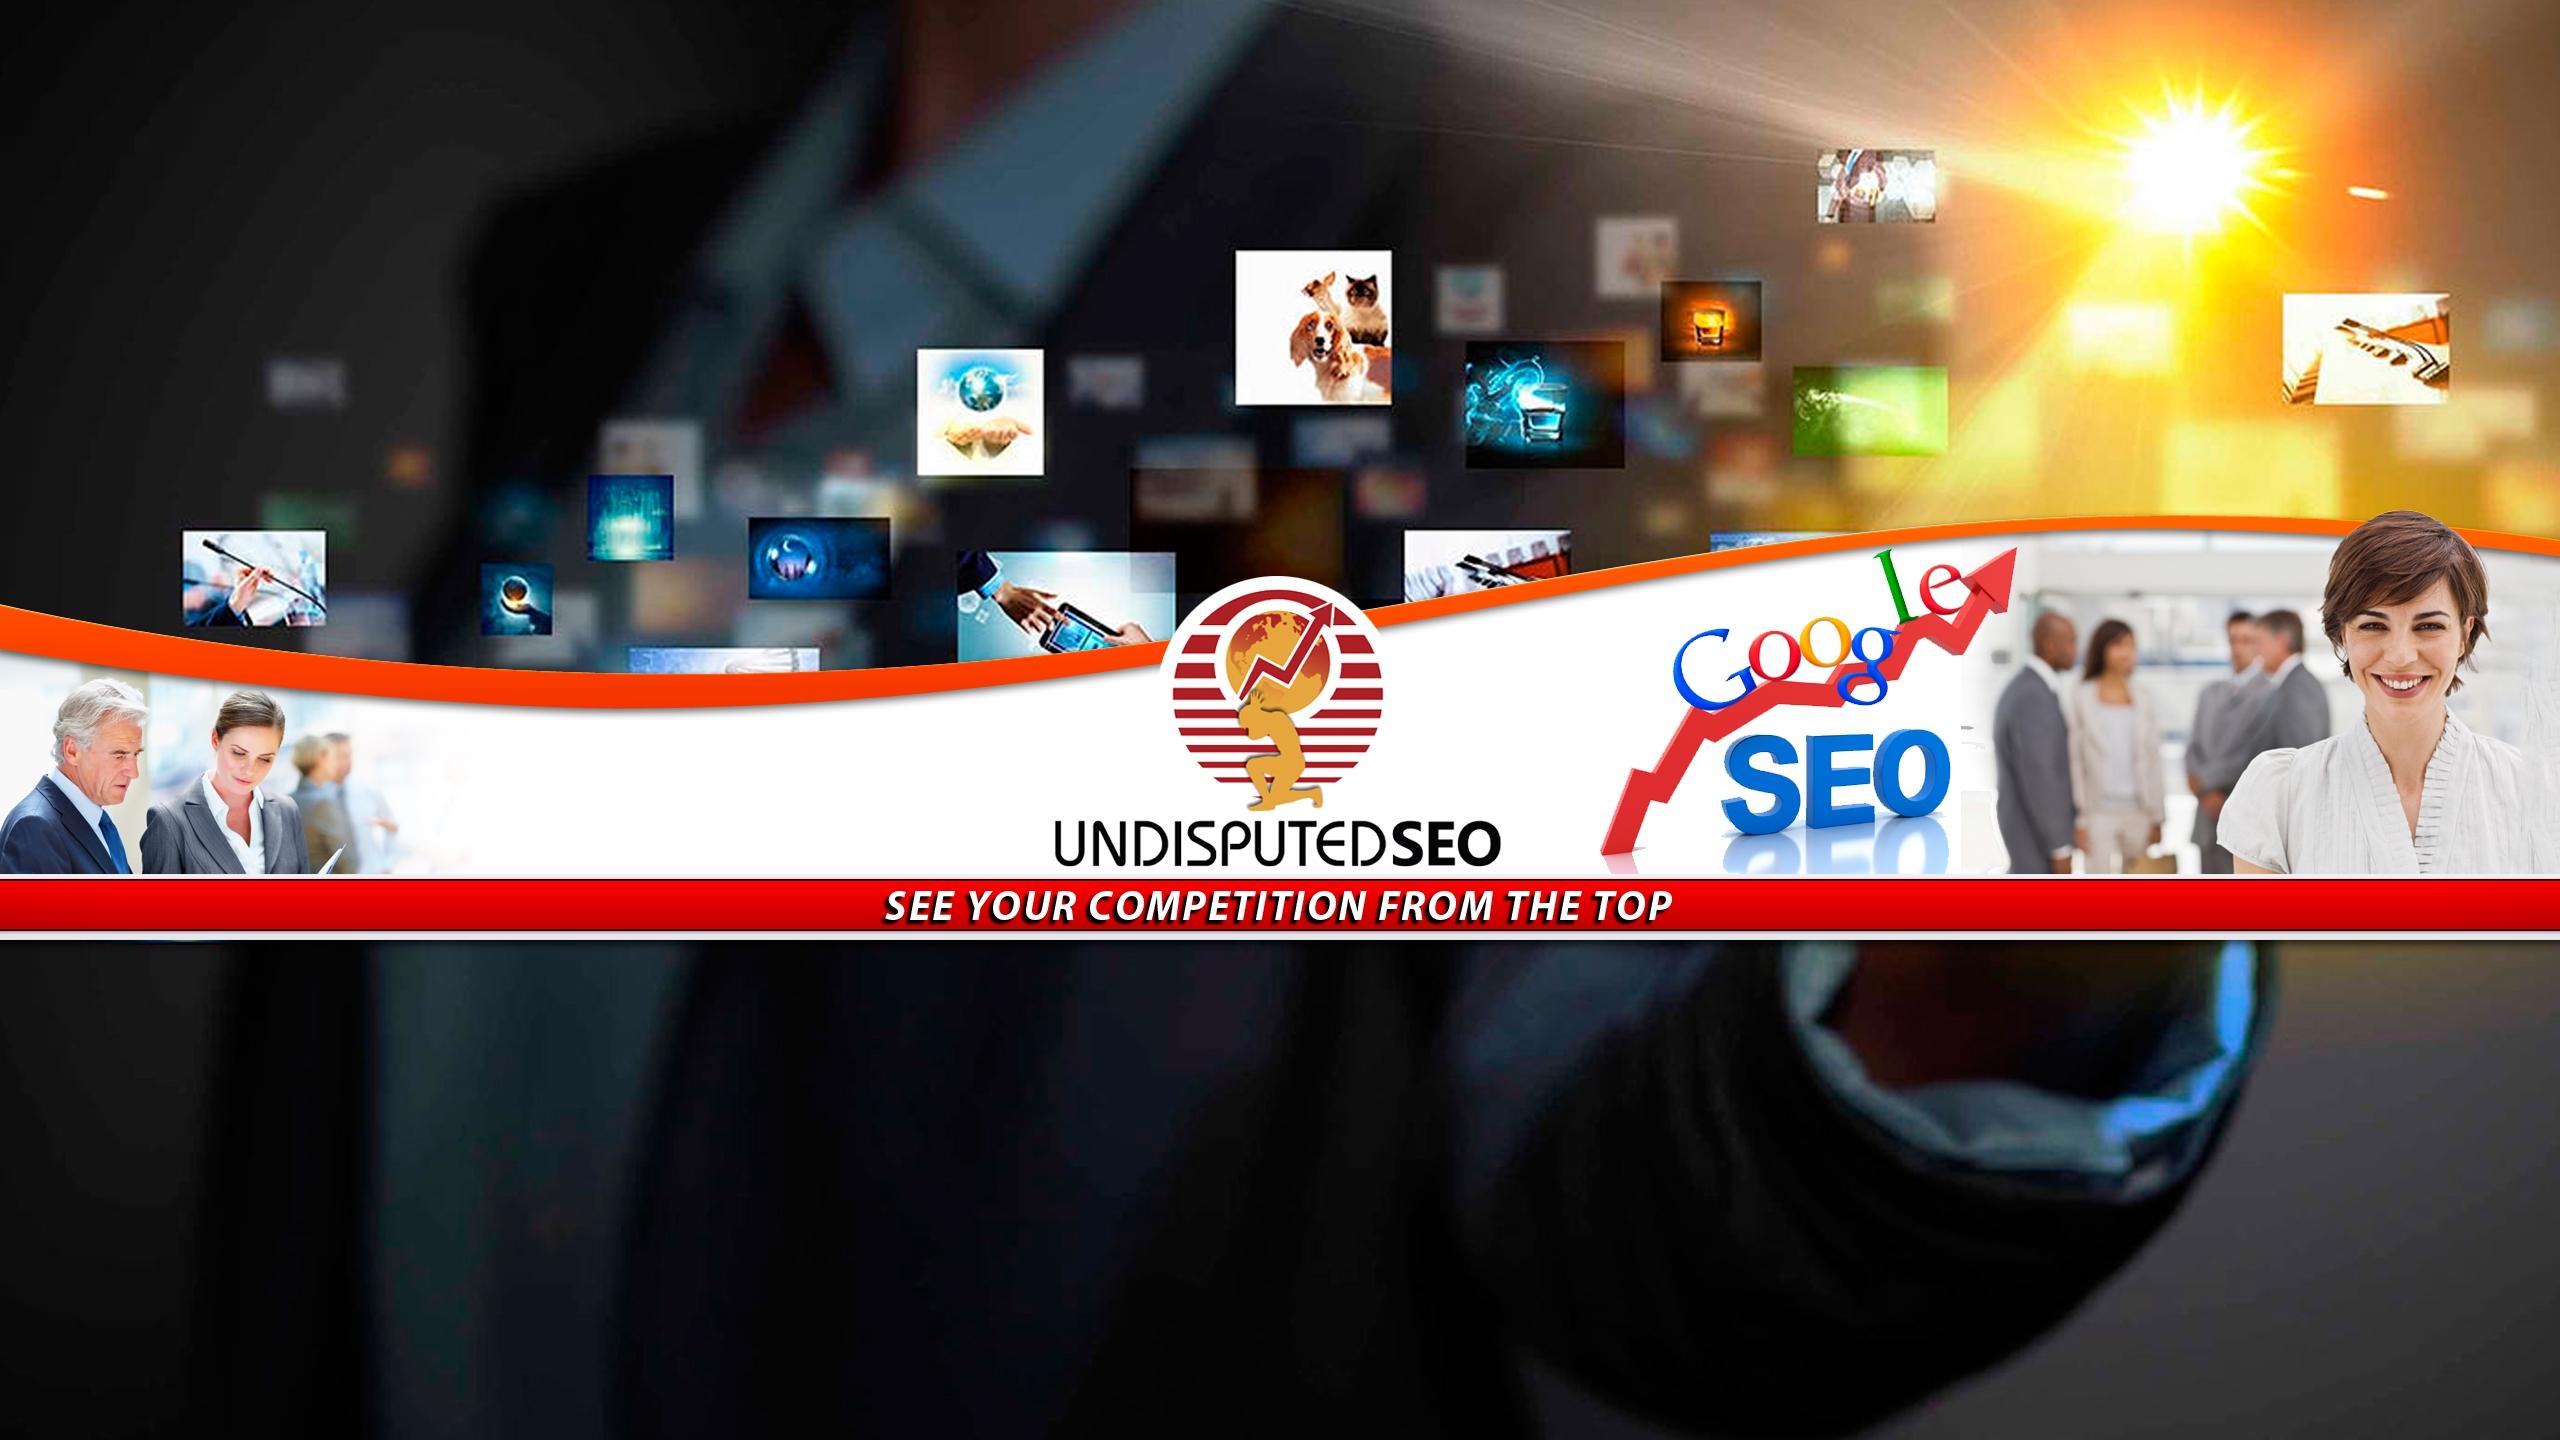 un (@undisputedseo) Cover Image